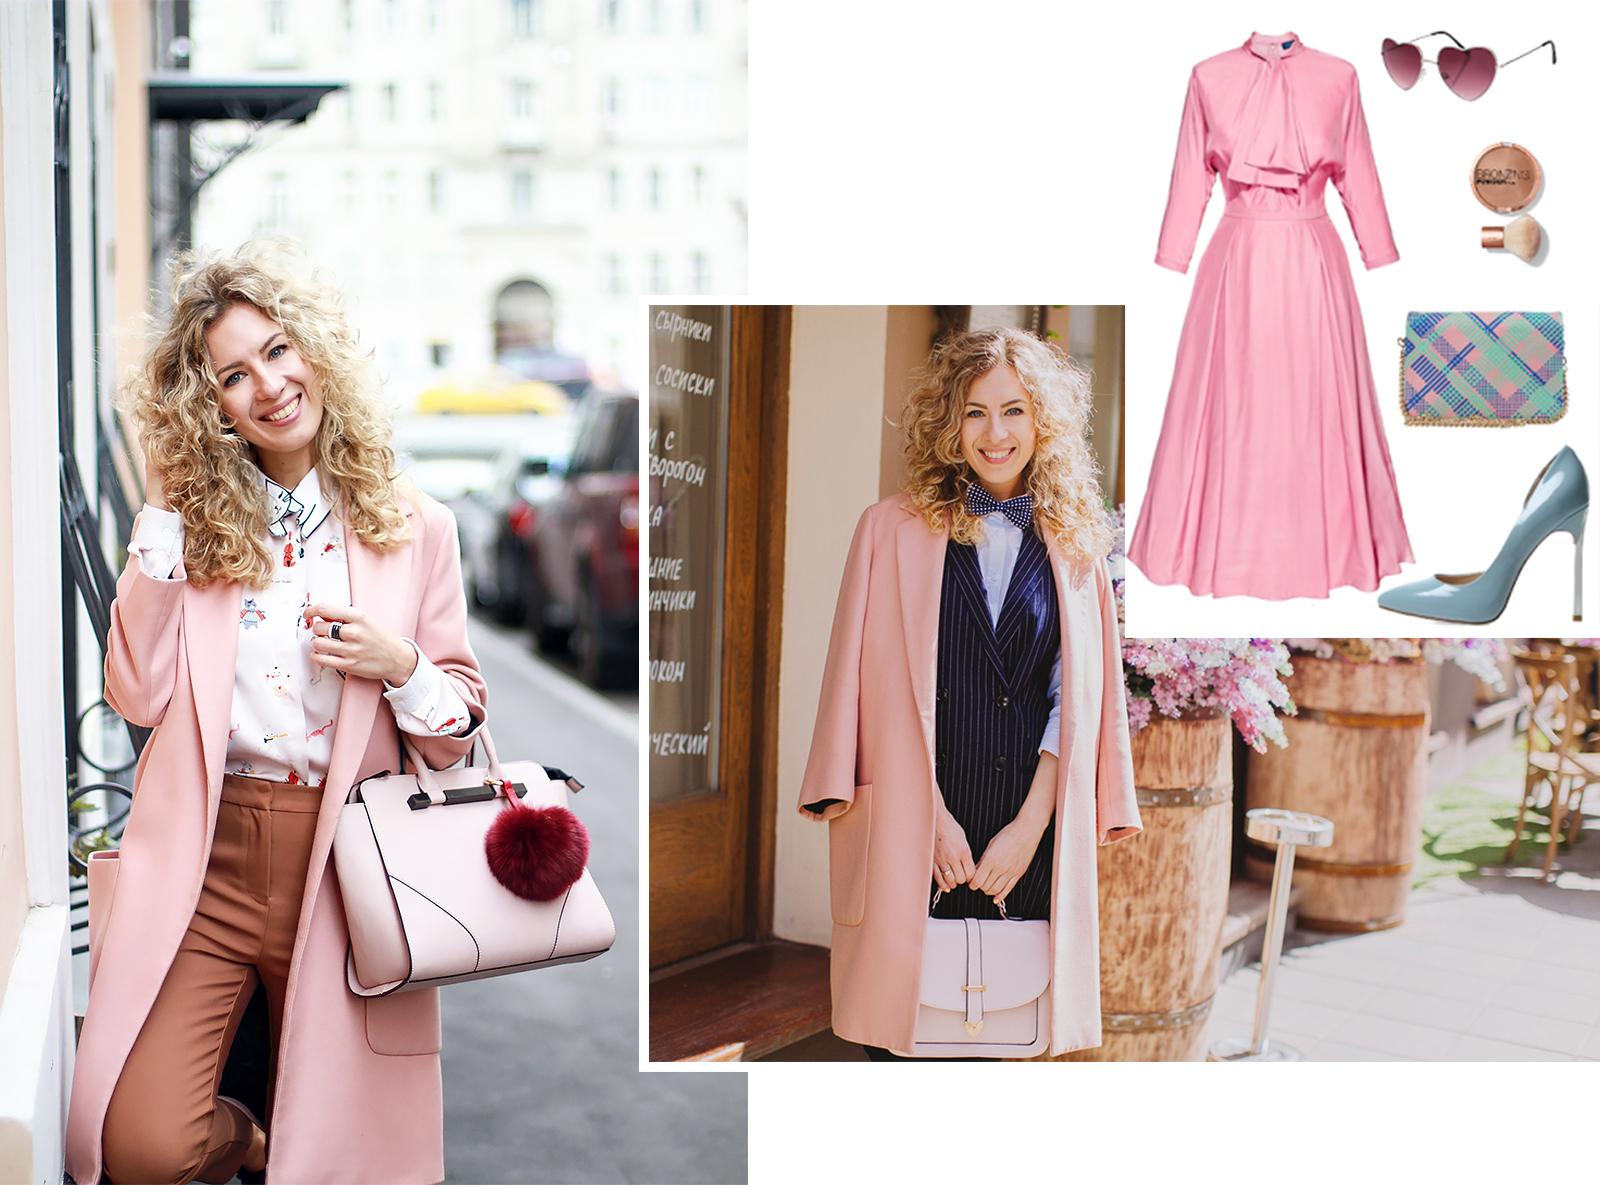 Margarita_Maslova Ritalifestyle_Fashion_blogger_Moscow_pastel_look_pink_color_looks